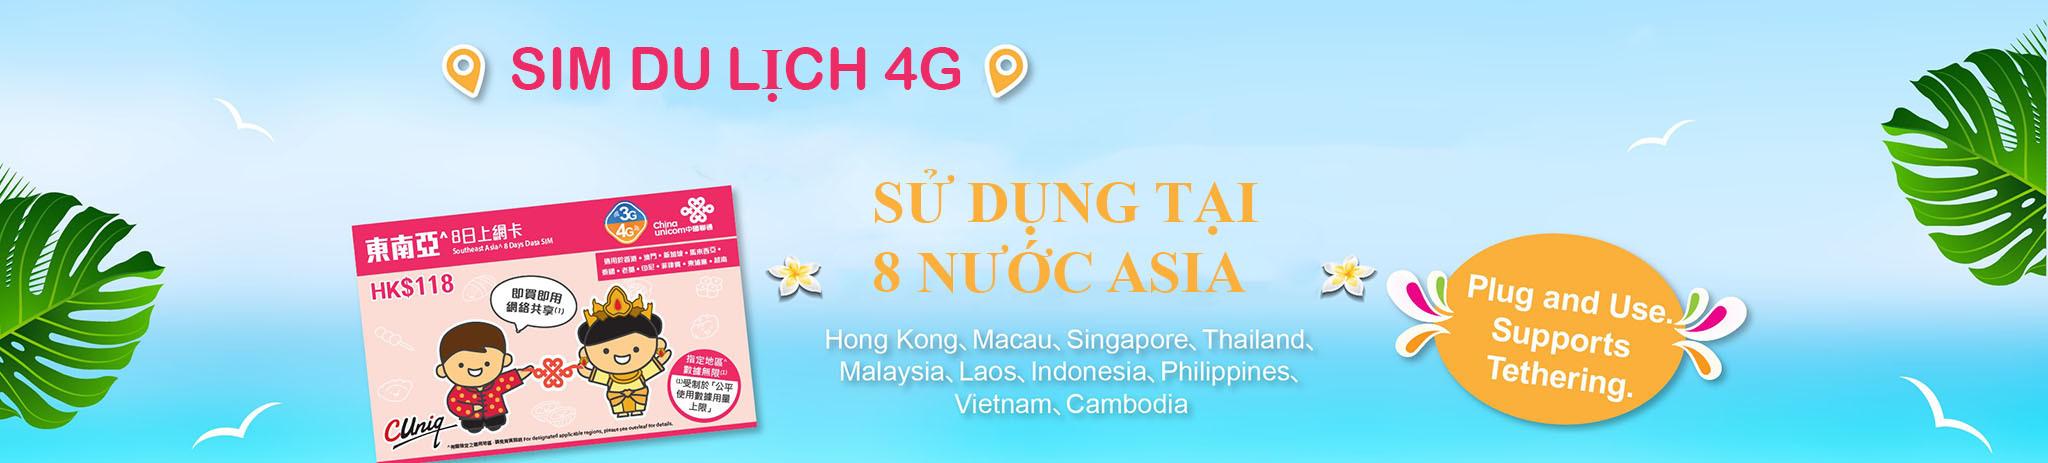 sim-4g-du-lich-8-nuoc-asia